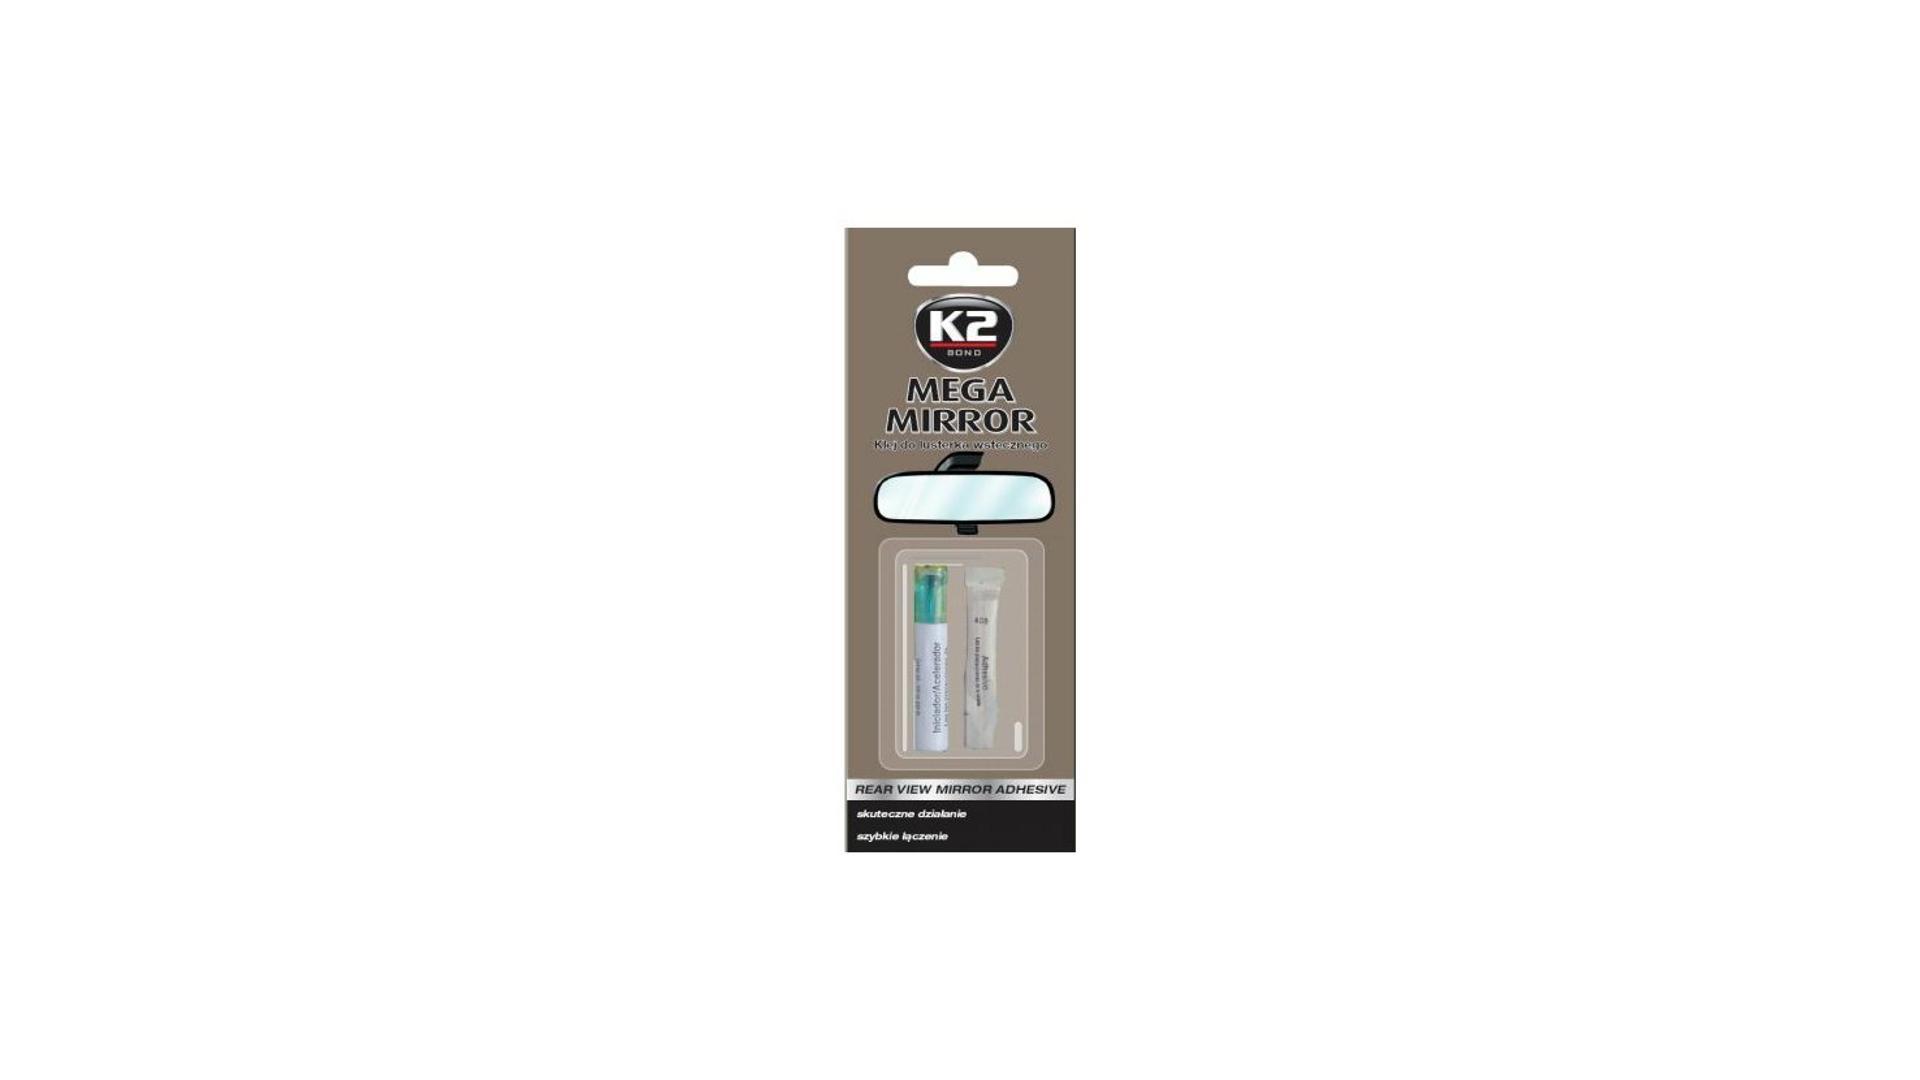 K2 MEGA MIRROR 6 ml - lepidlo na spätné zrkadlo